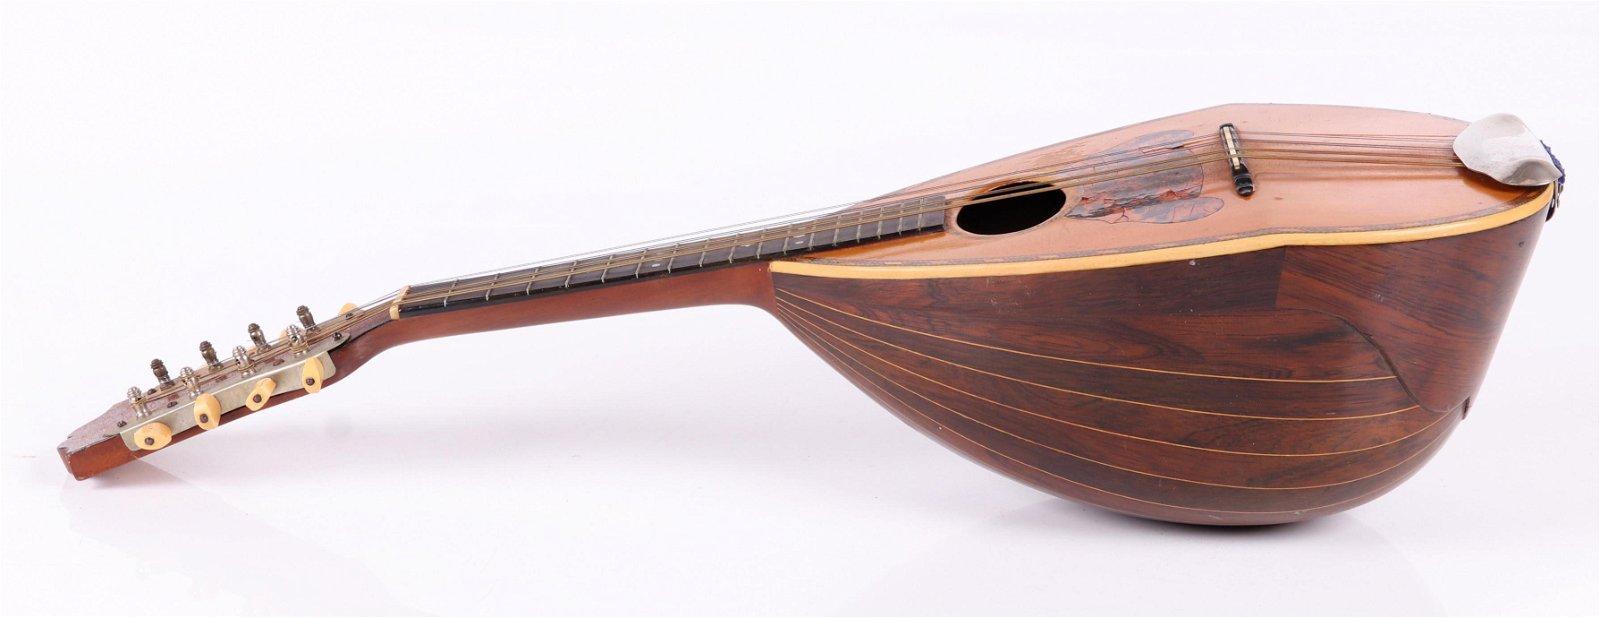 An Early 20th Century Weymann Mandolin